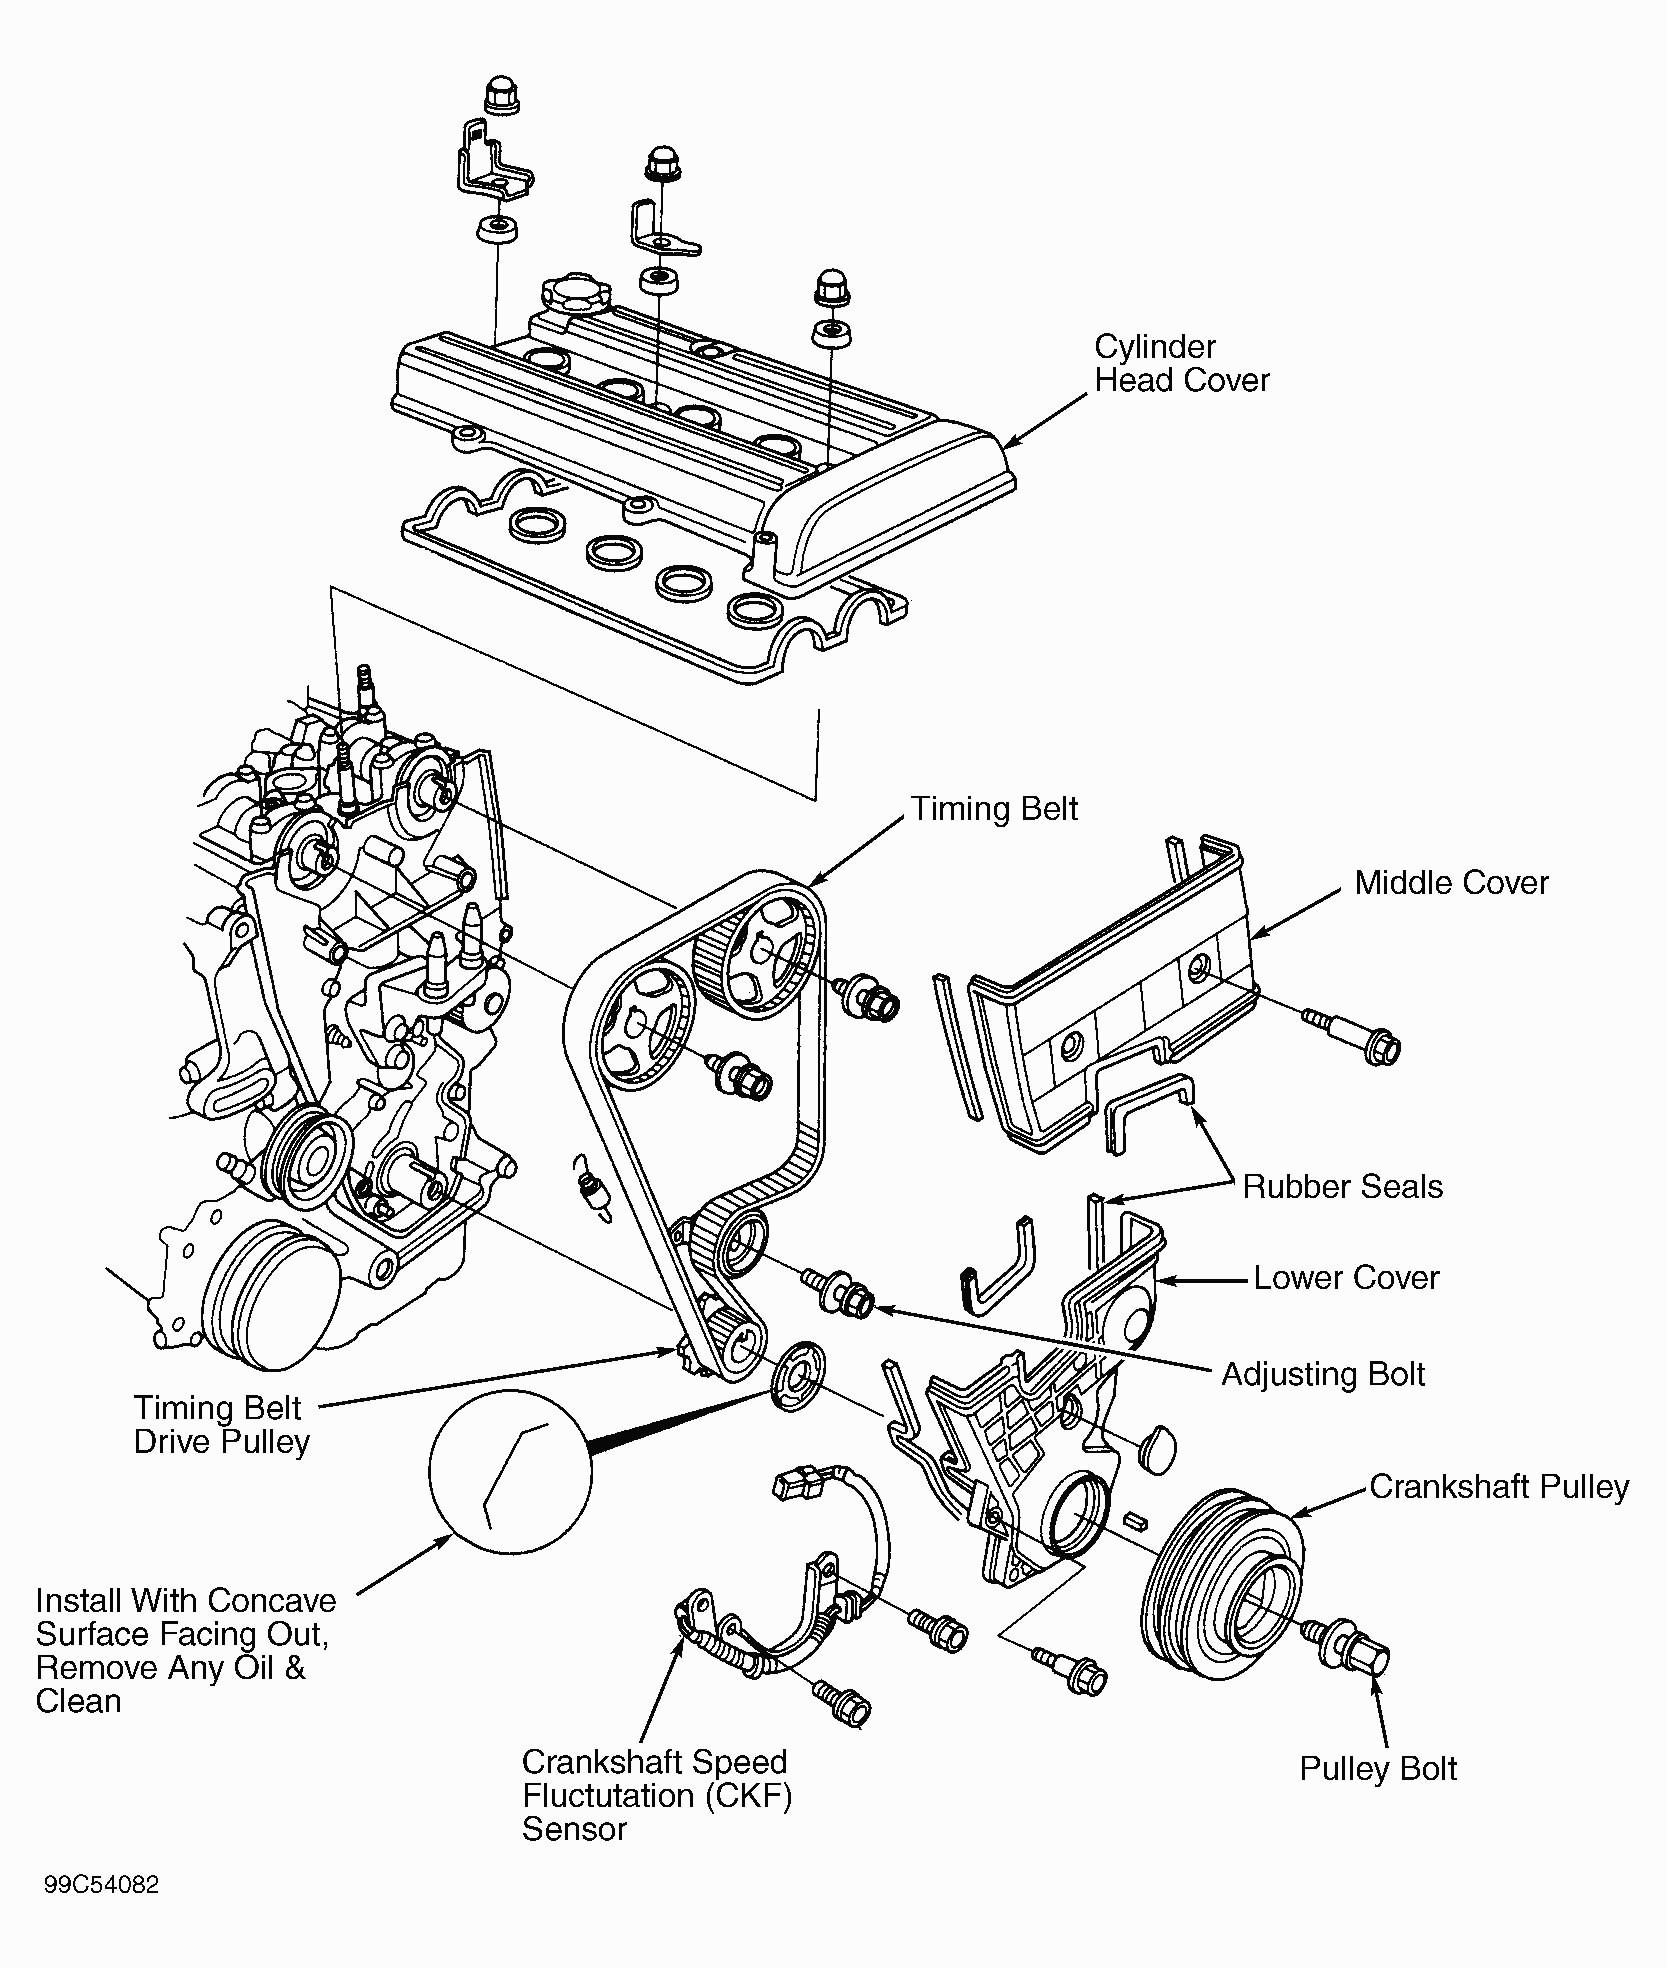 2005 Honda Cr V Engine Bay Diagram - Wiring Diagram Replace flu-check -  flu-check.miramontiseo.it | 2005 Honda Cr V Engine Diagram |  | flu-check.miramontiseo.it